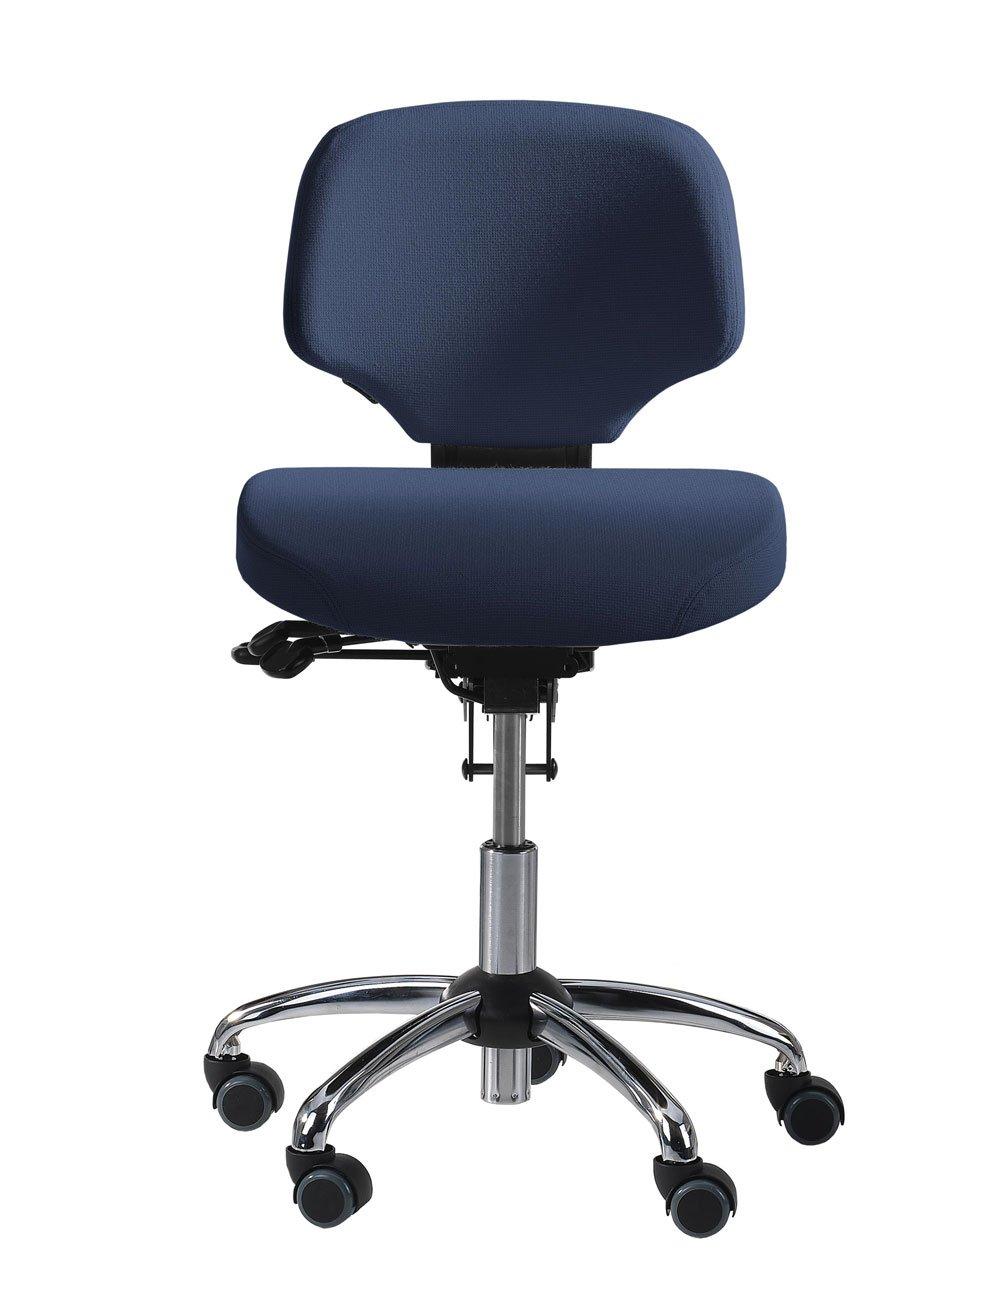 RH Chairs RH Activ 200 Chair £492.00 Inc.